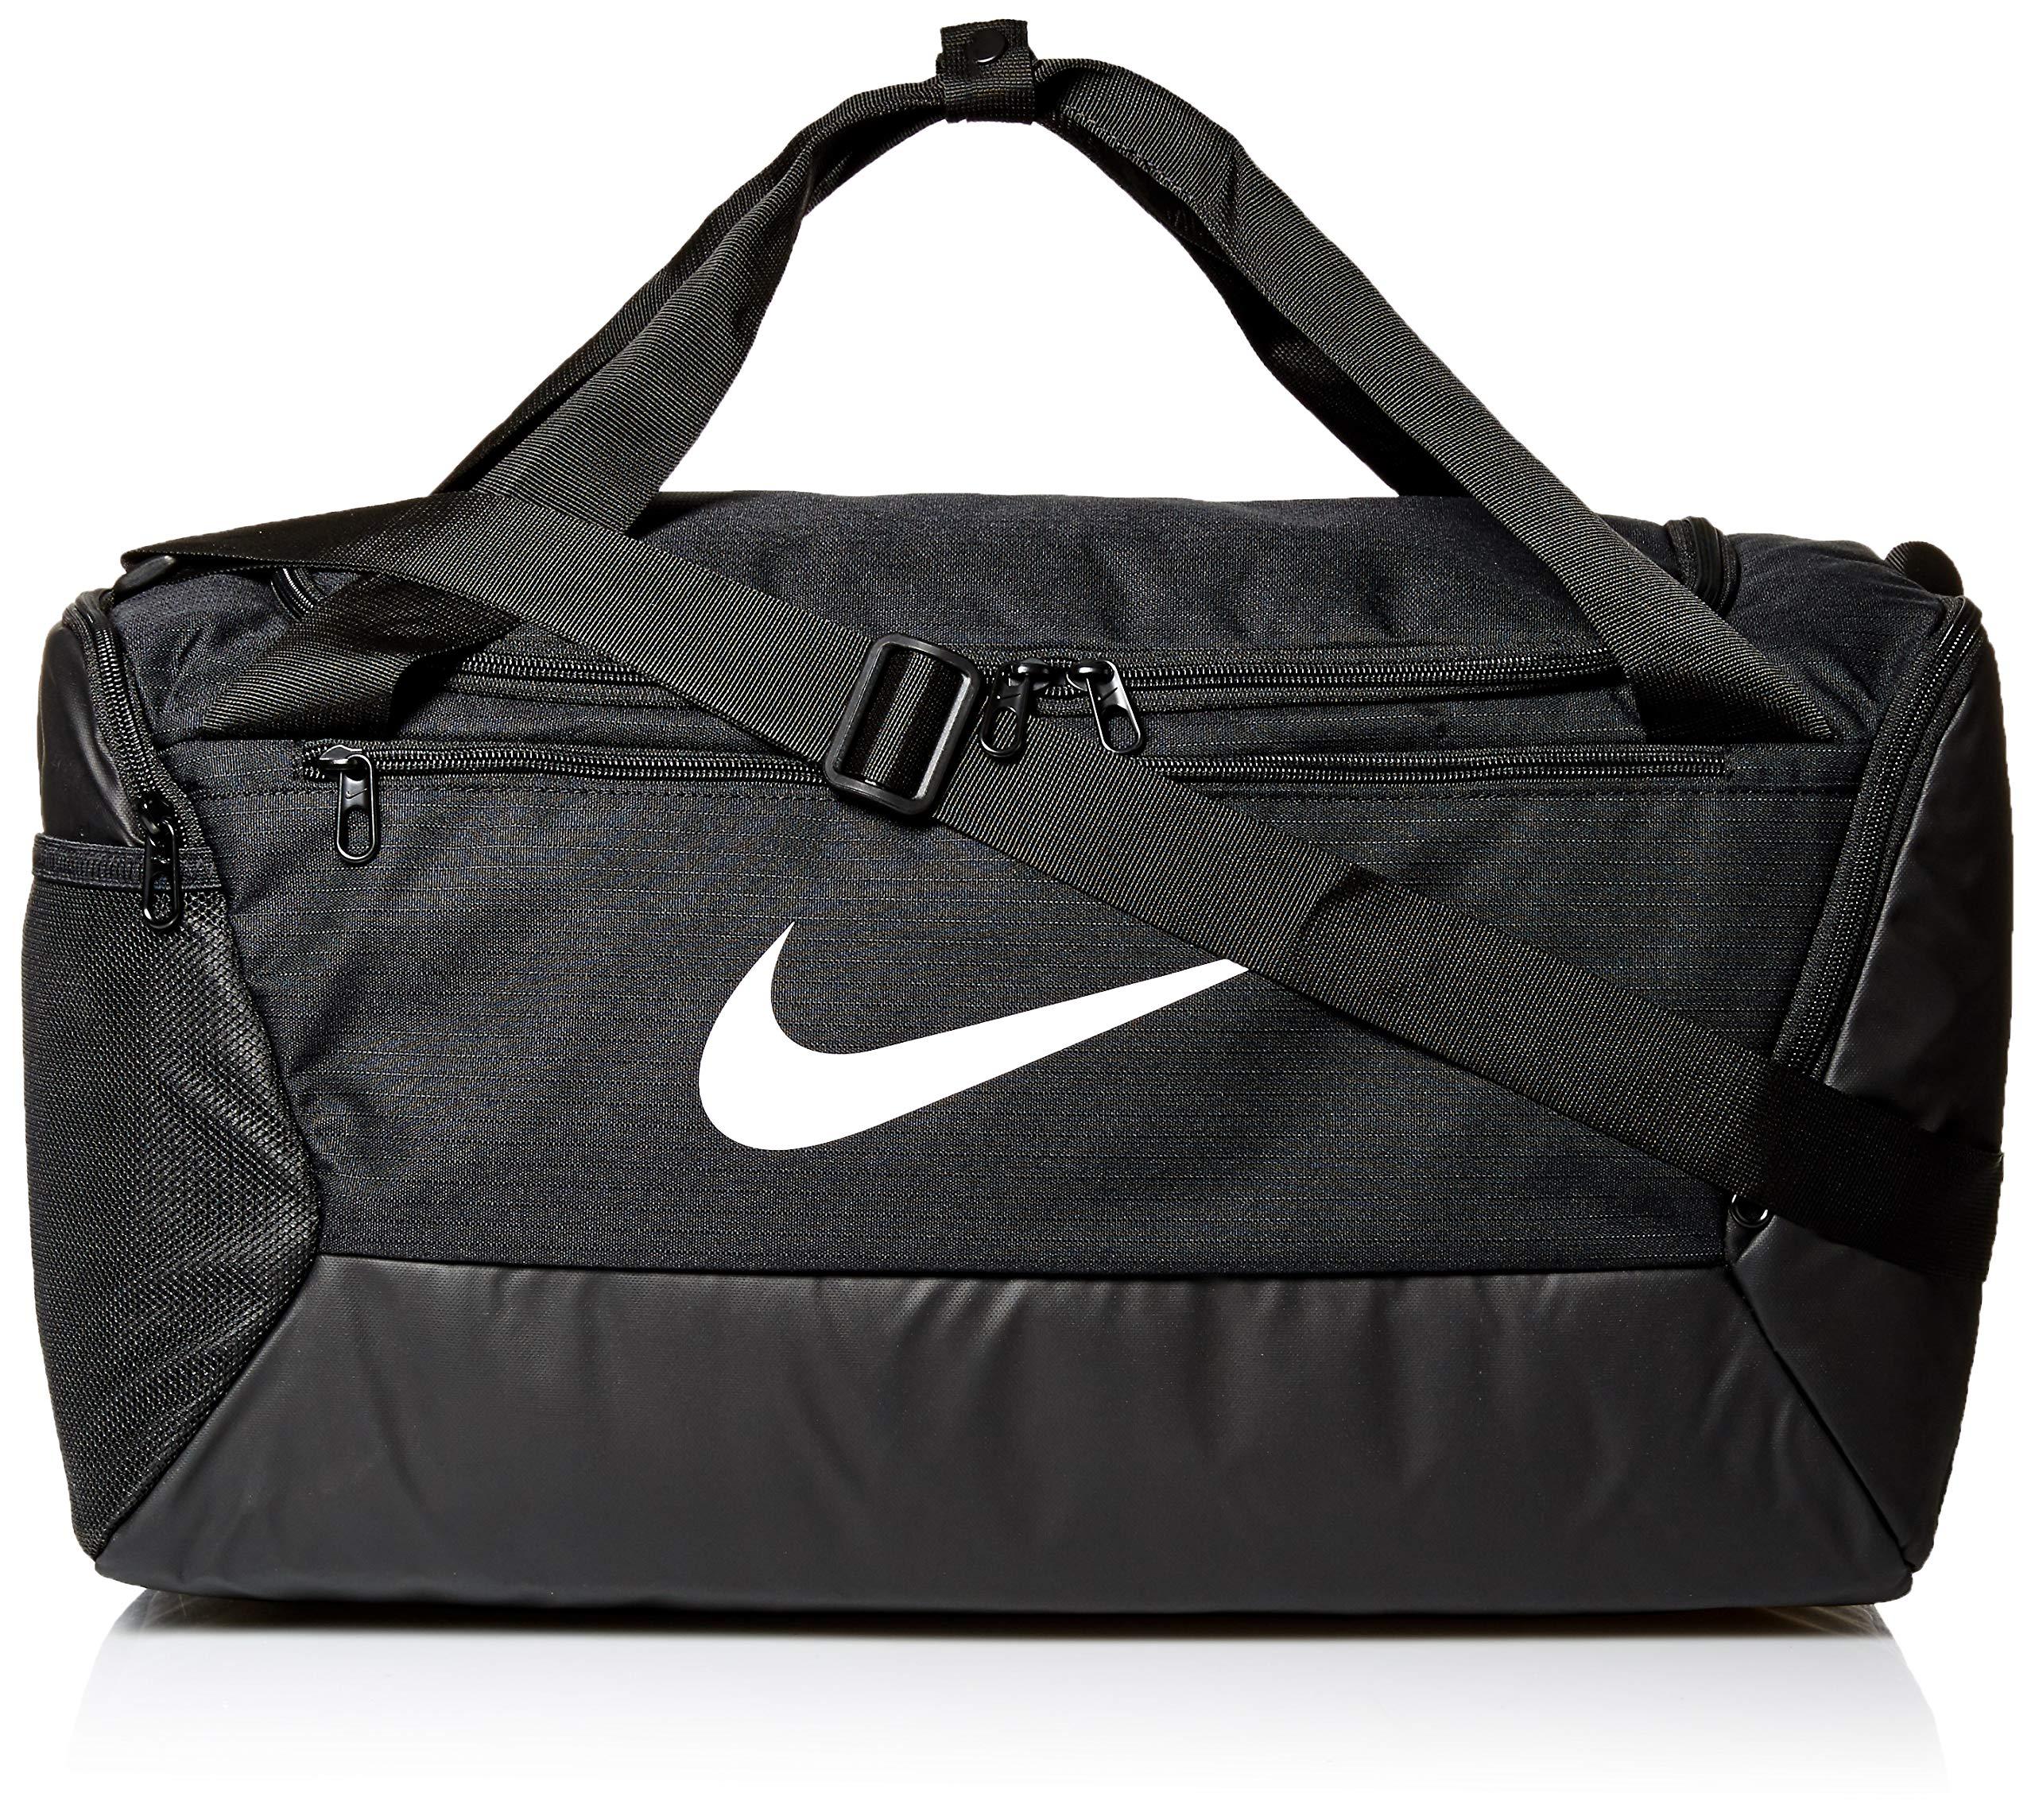 Nike Brasilia Small Duffel Black